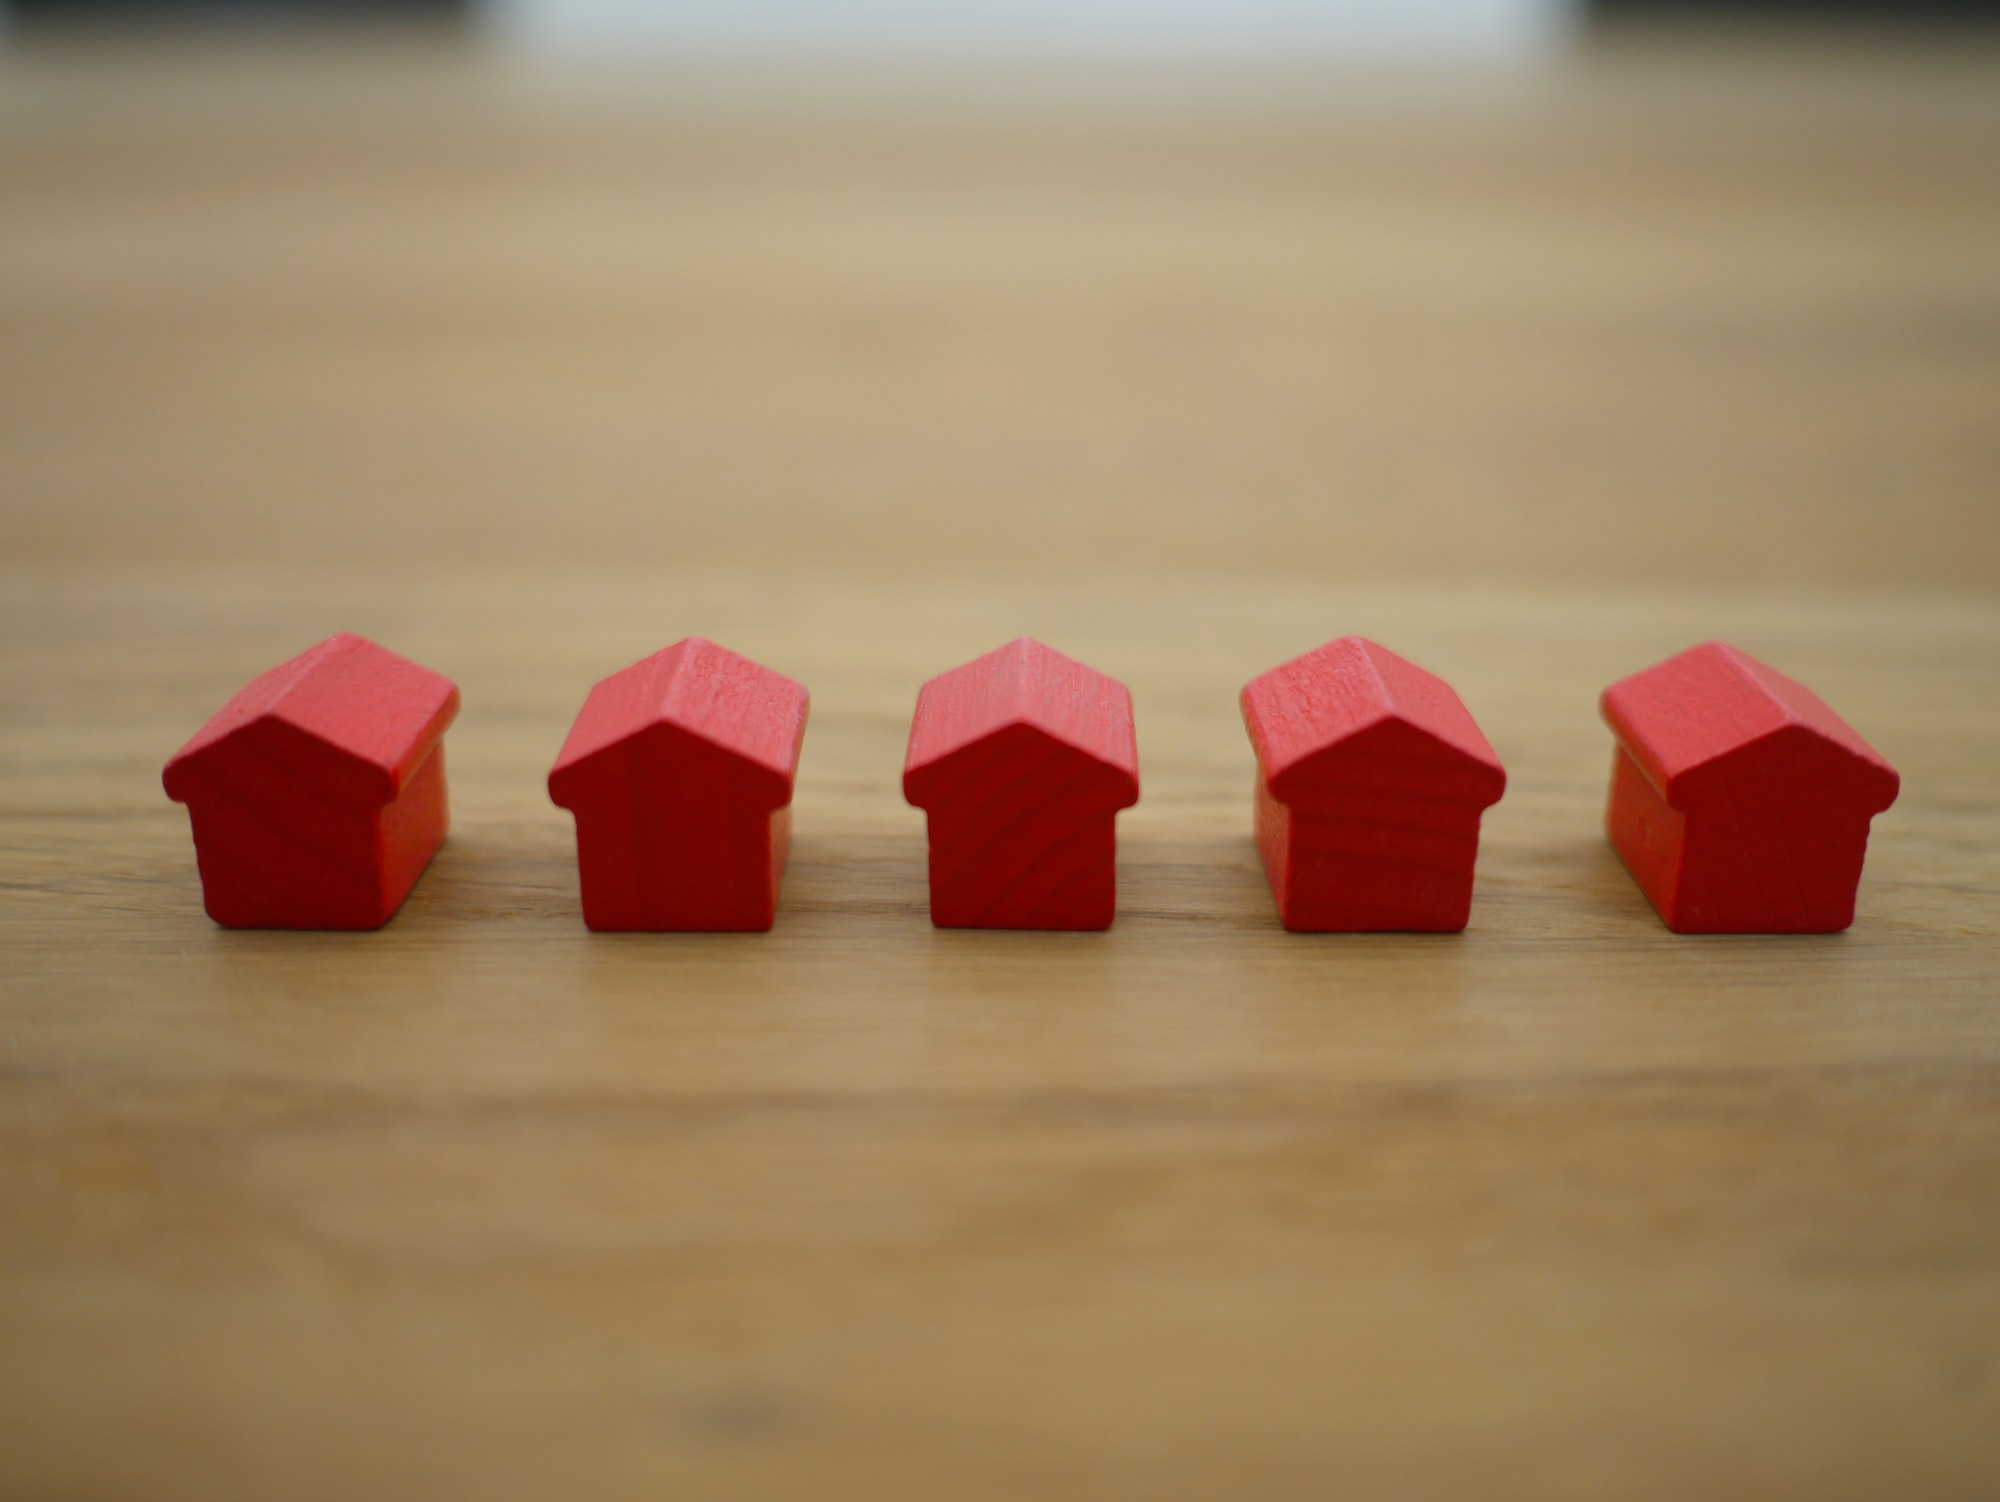 BMO预测房价极限下跌29%